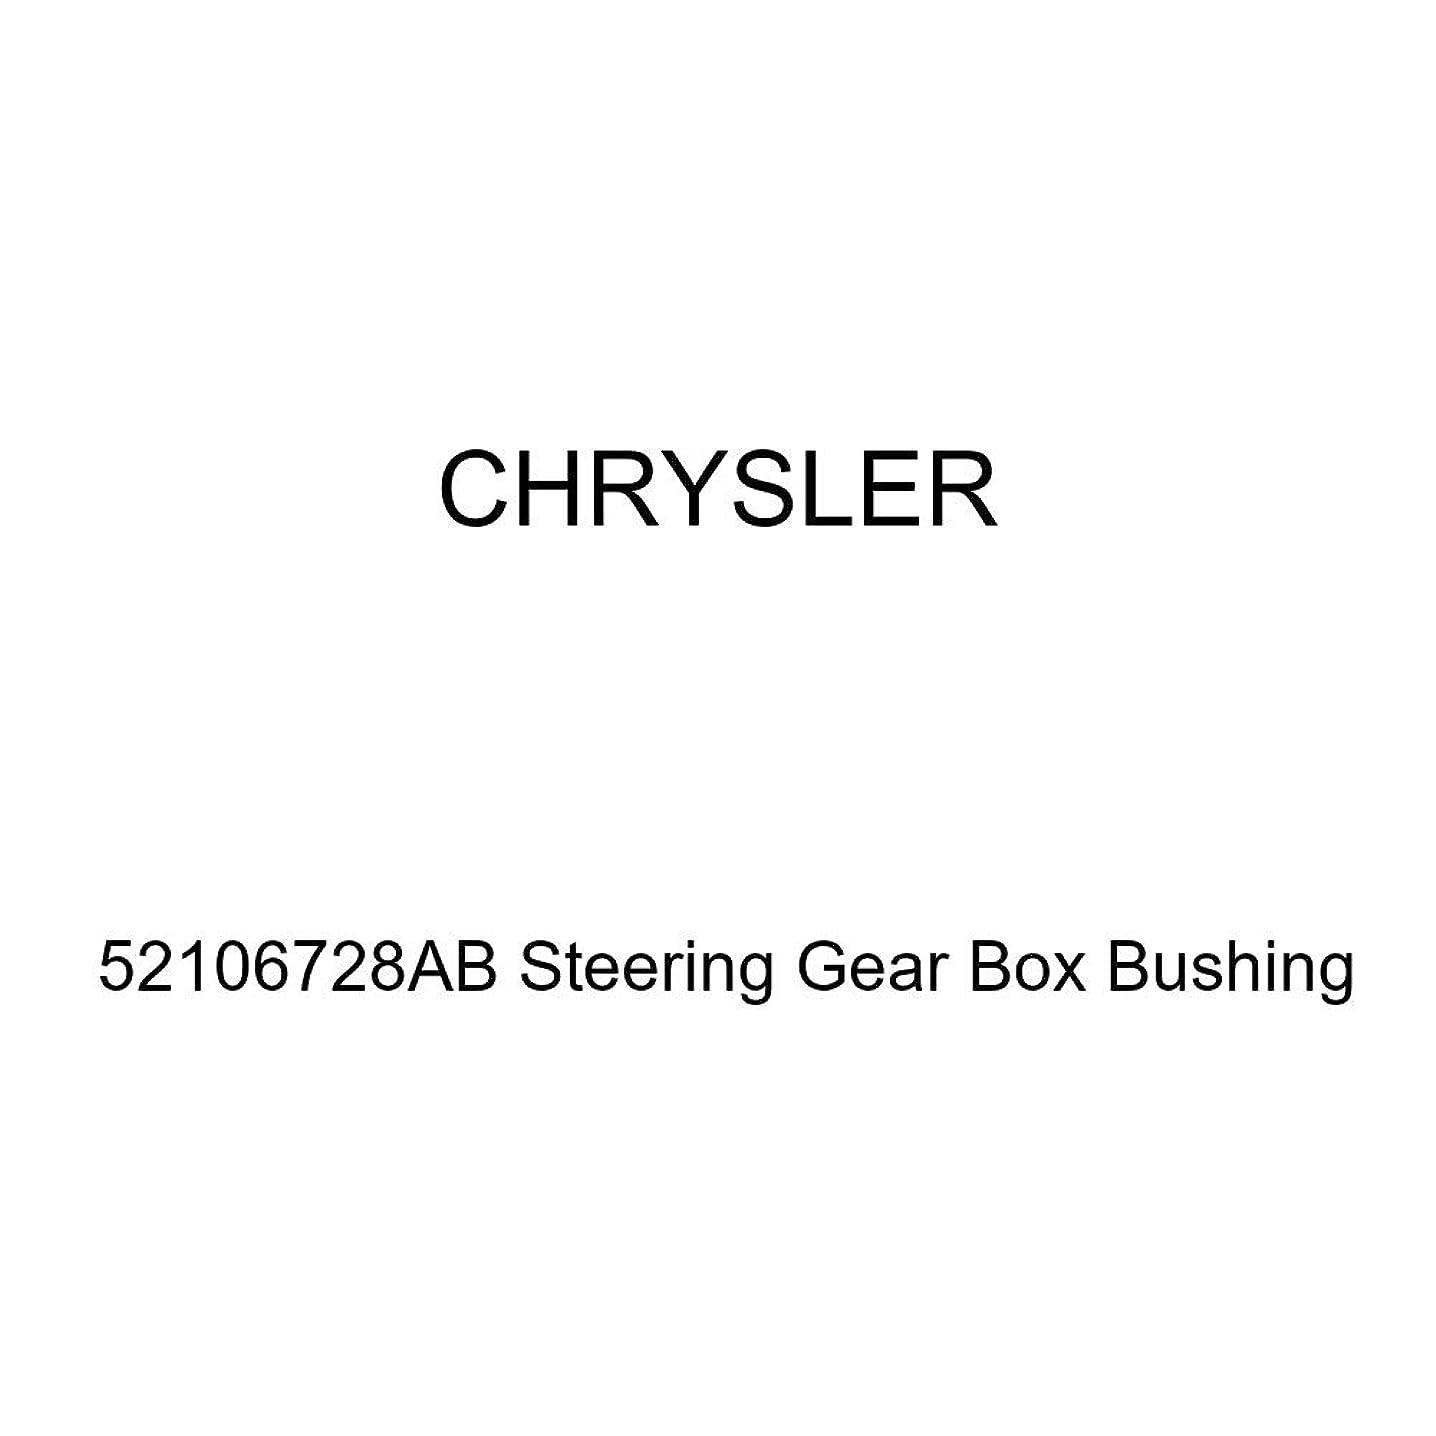 Genuine Chrysler 52106728AB Steering Gear Box Bushing brfwzvaiw